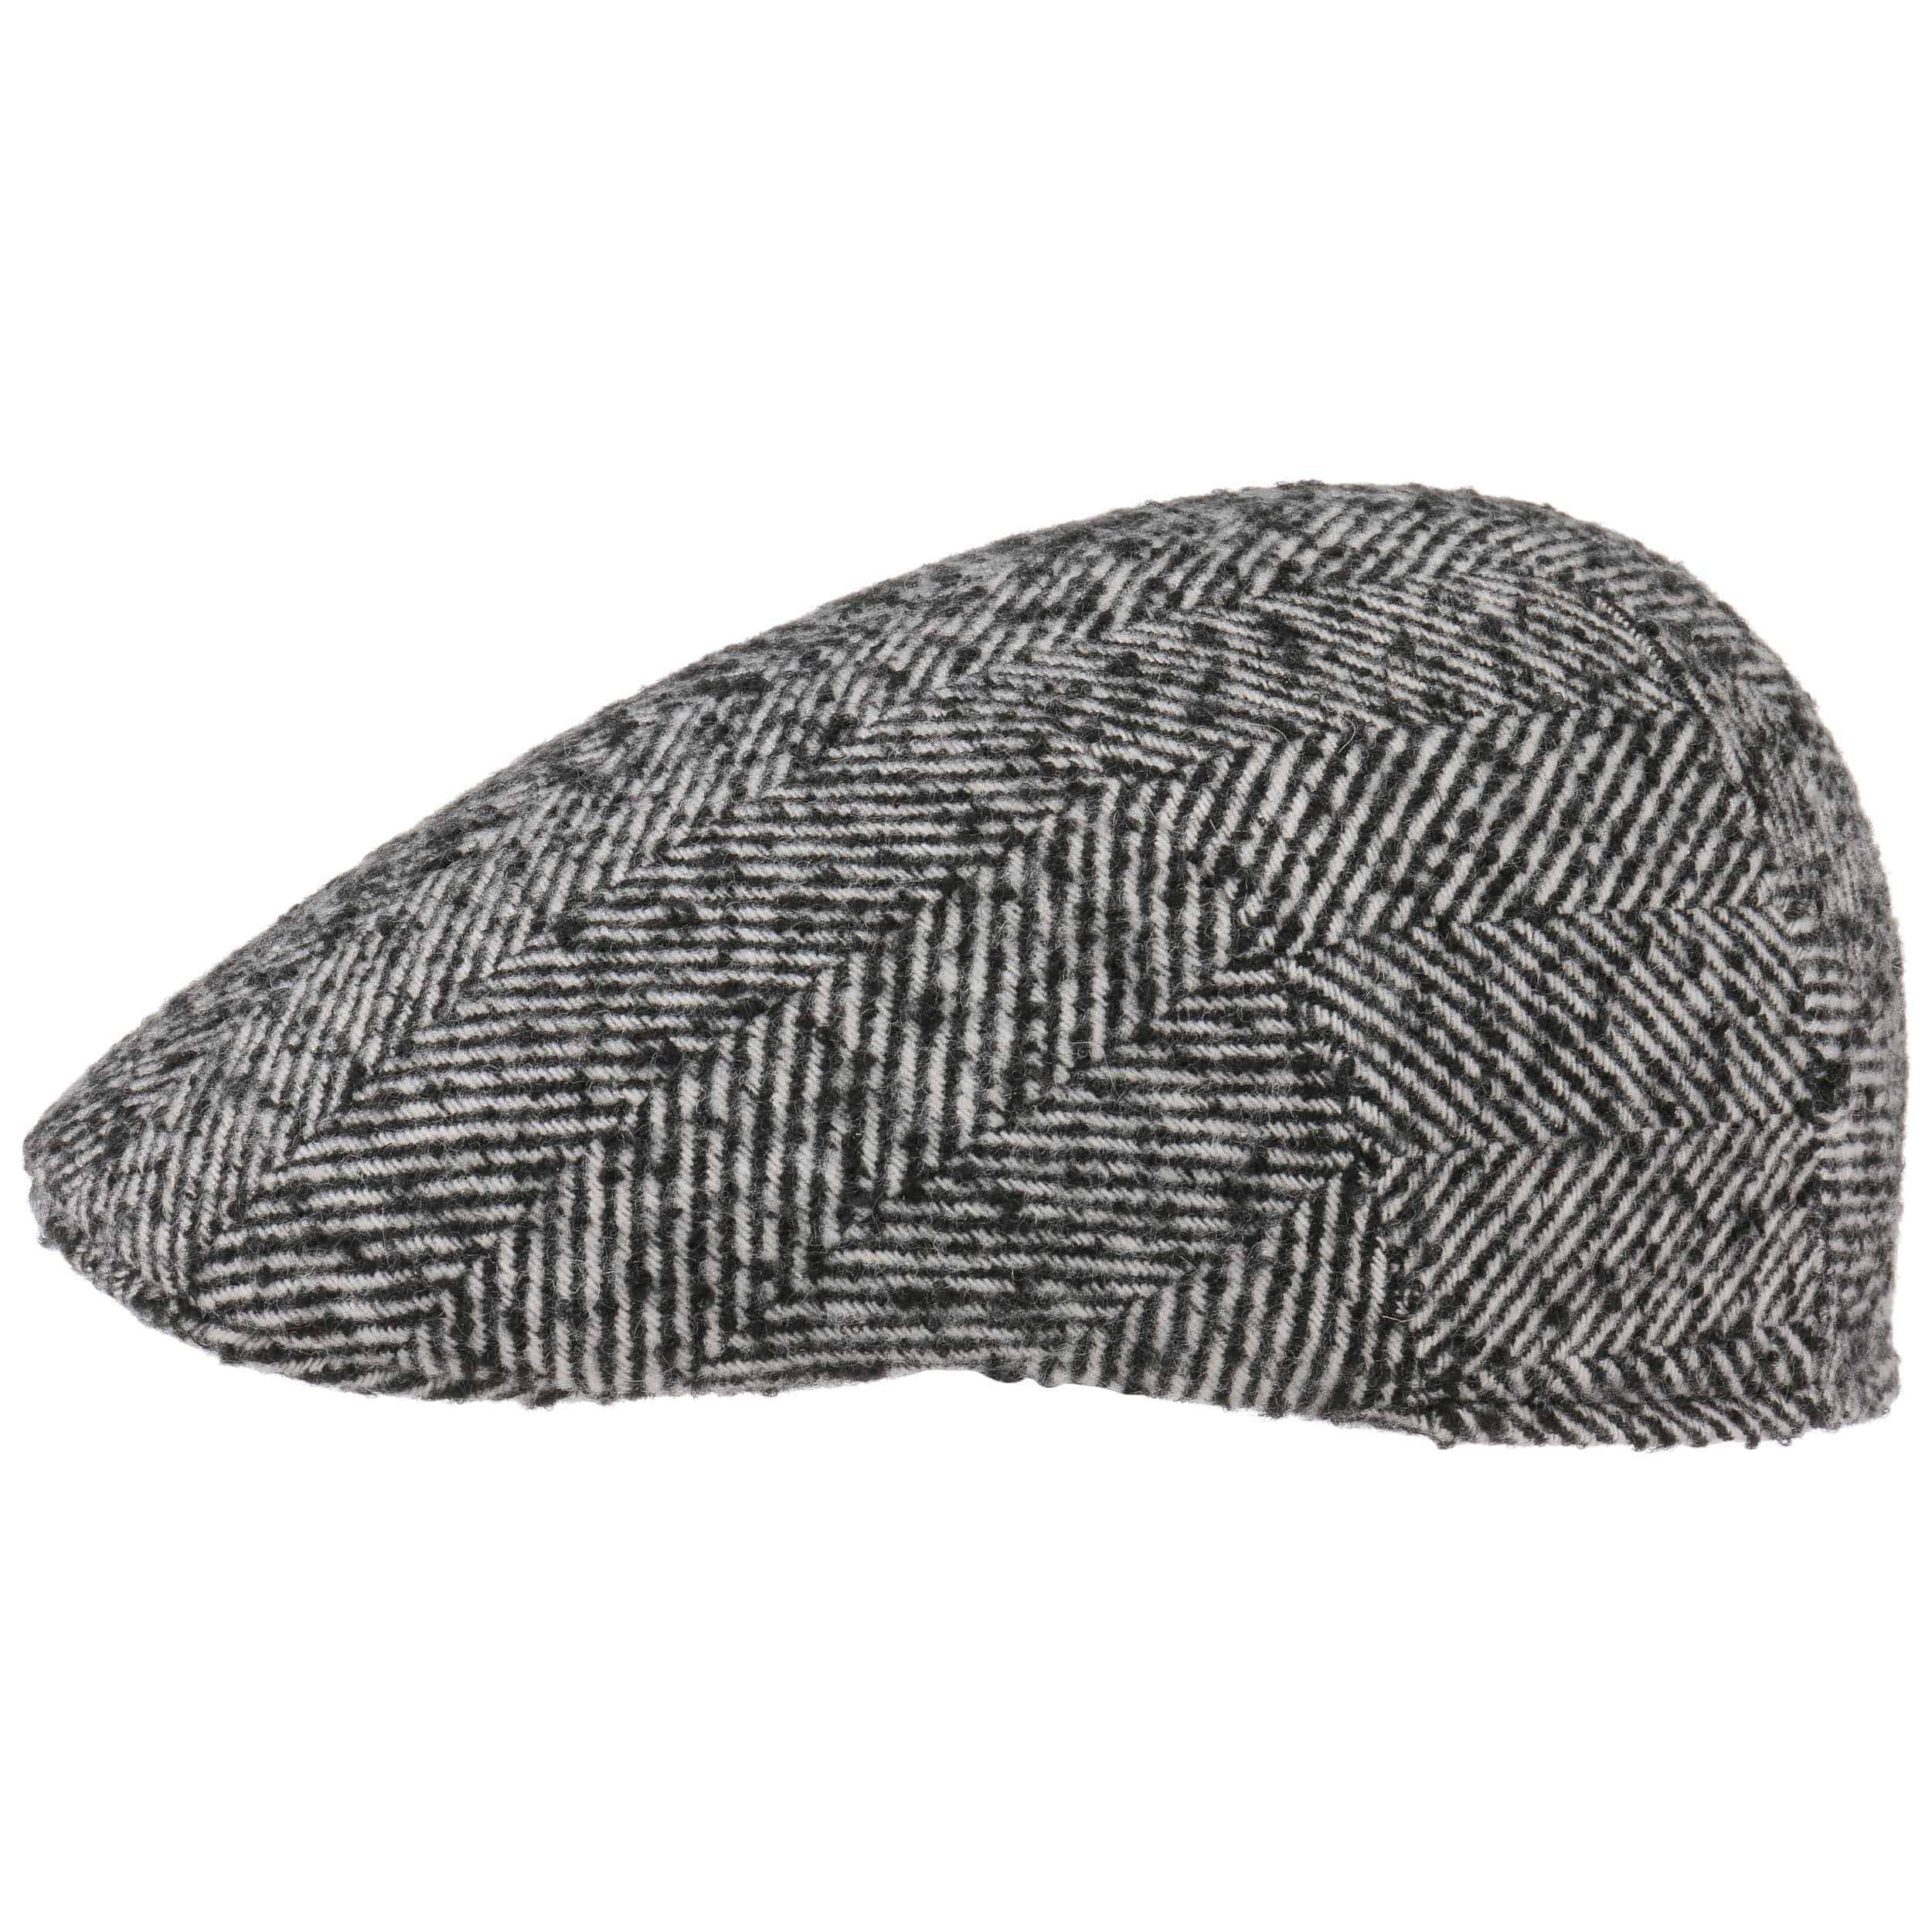 Gorra Giovanni by Lipodo - Gorras - sombreroshop.es 48f2b3eca28e